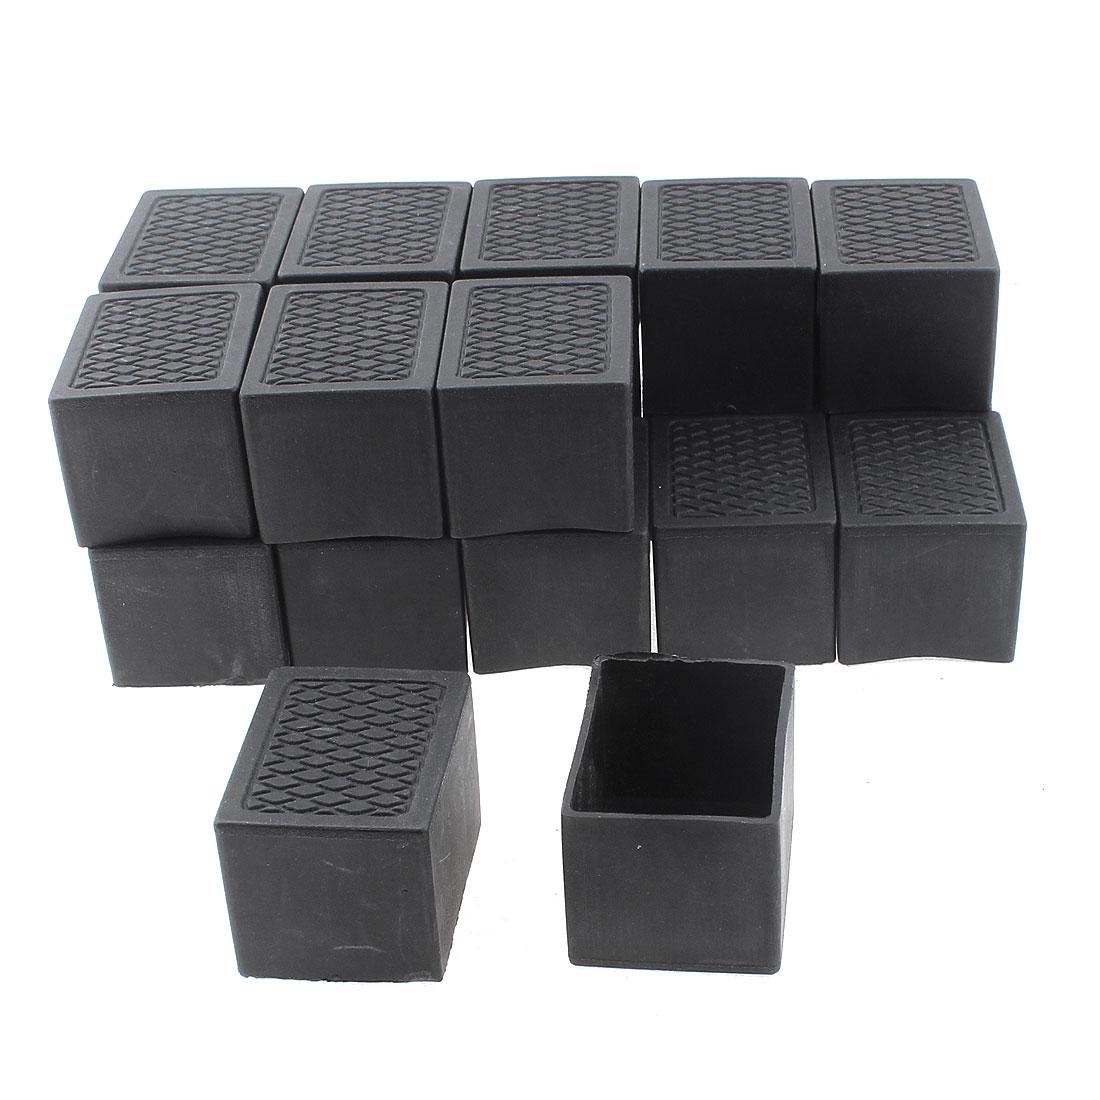 40mm x 30mm Rectangle Shaped Furniture Table Chair Leg Foot Plastic Cover Cap Black 20pcs